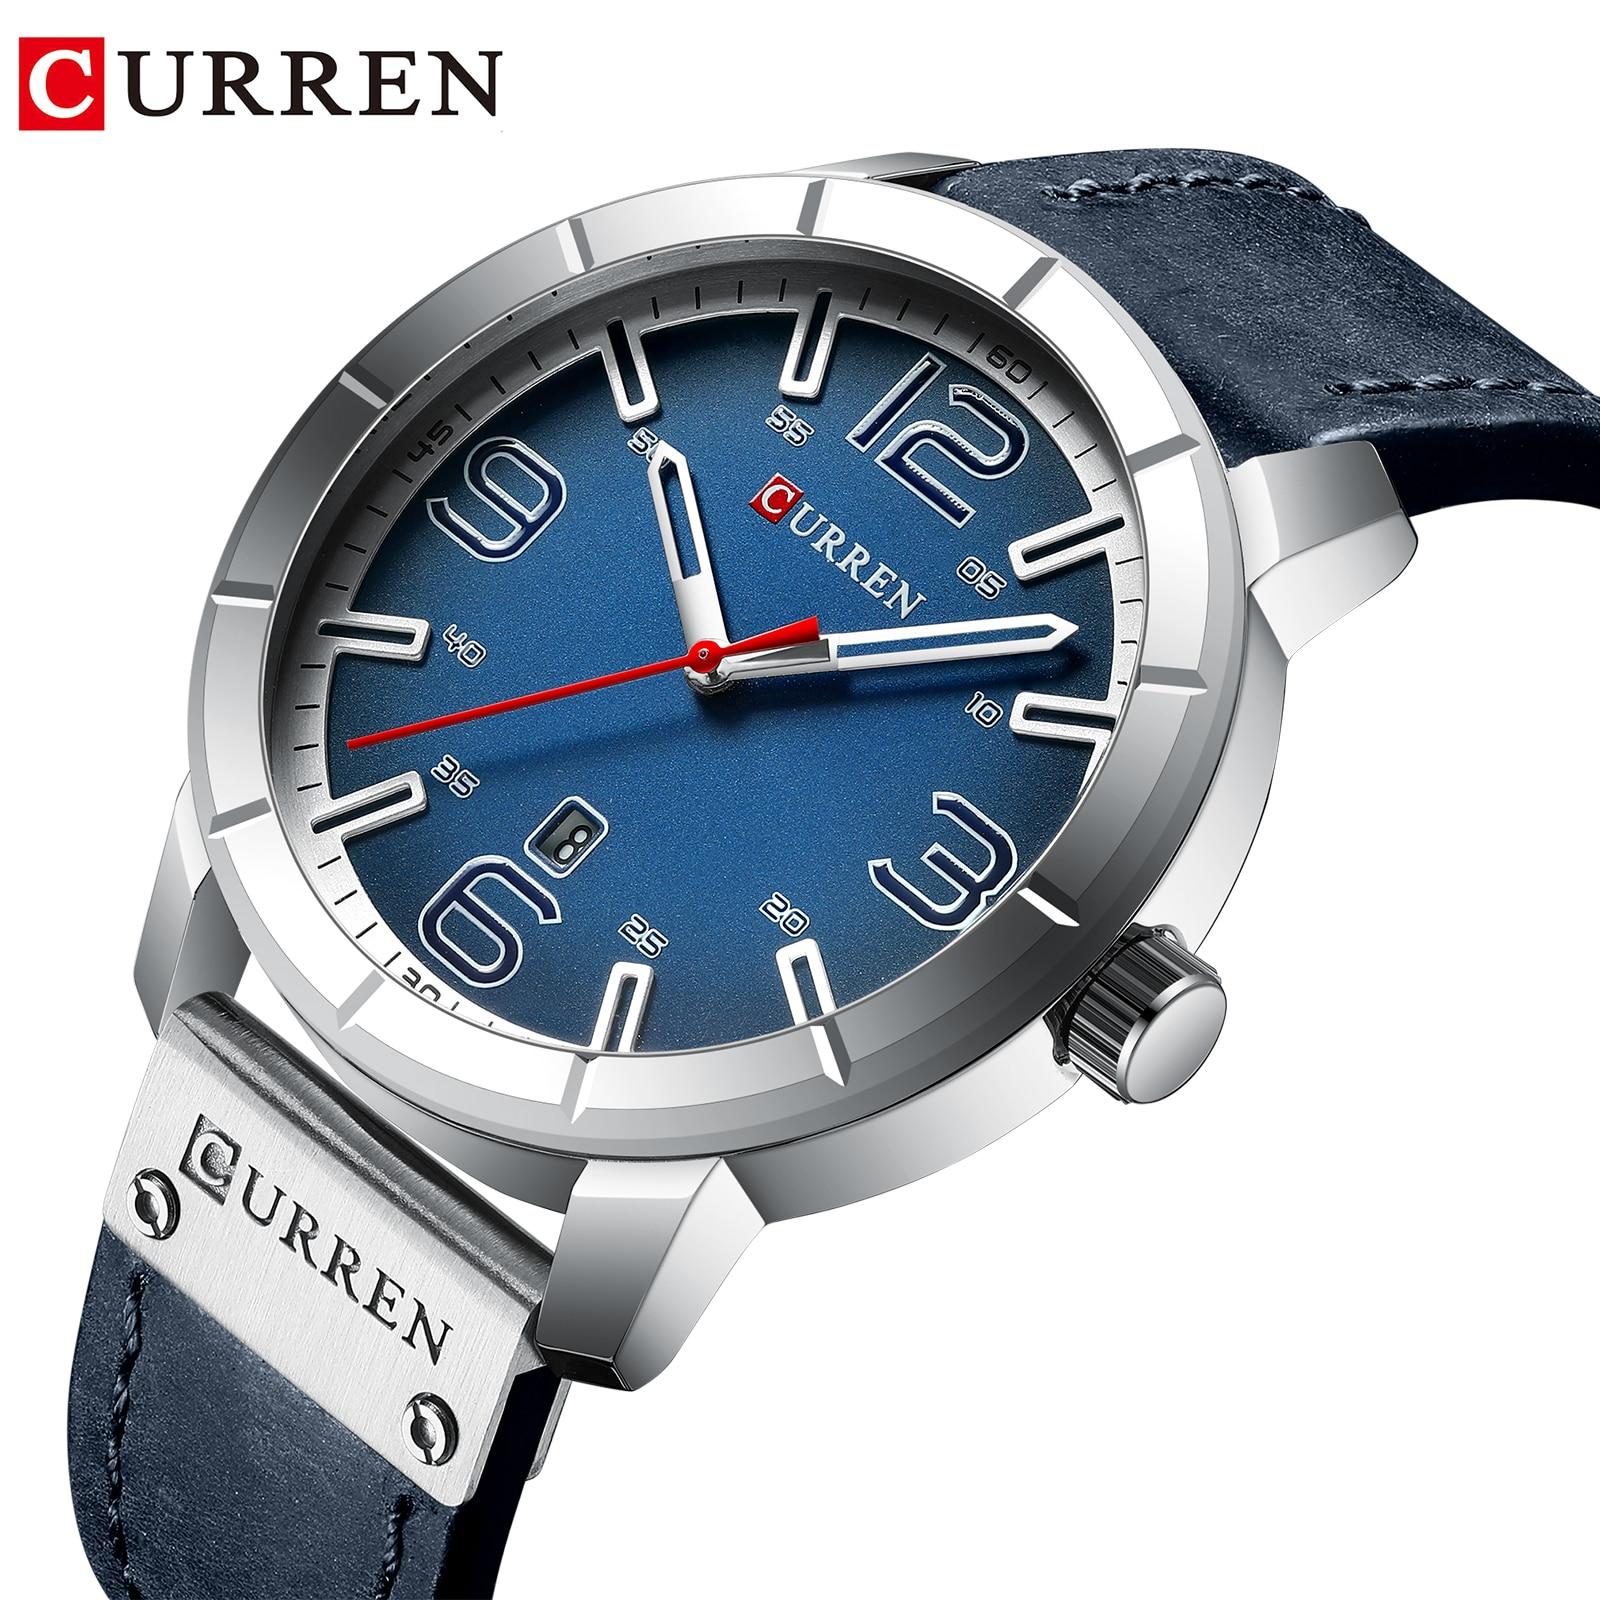 CURREN Sports Leather Watch Luxury Brand Watches Quartz Wristwatch Business Calendar Quartz Clock Horloge Heren